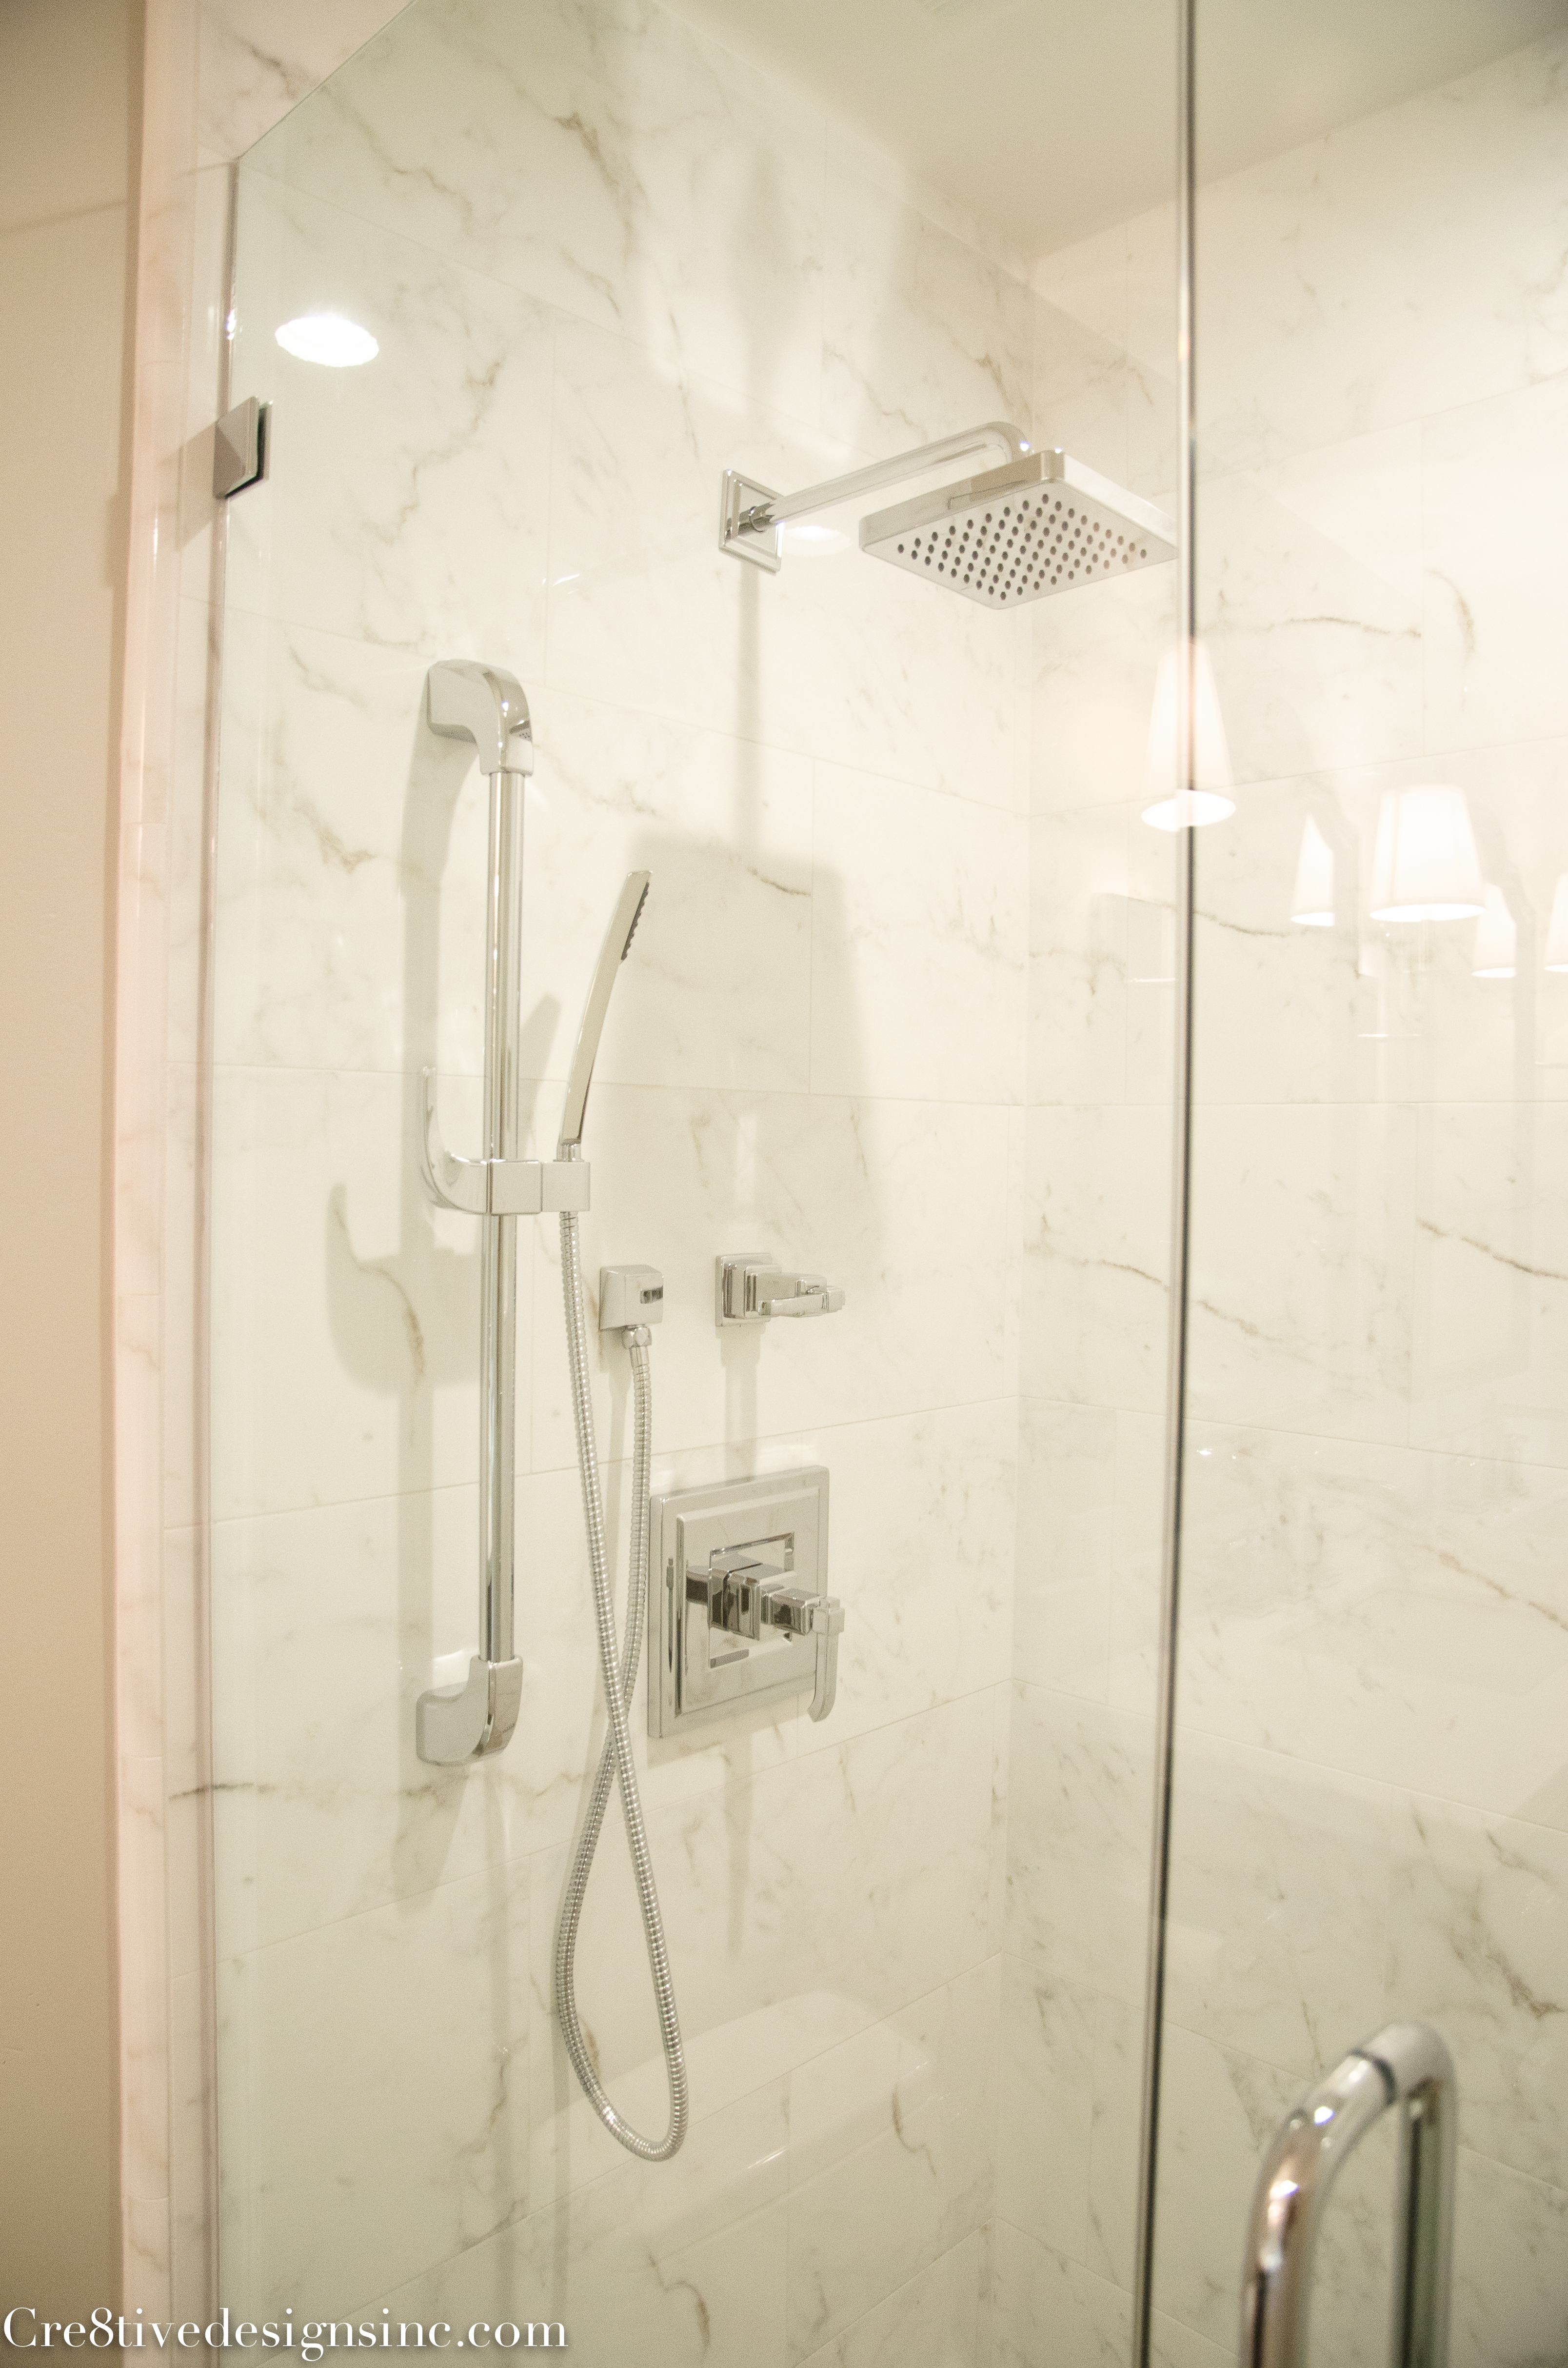 Cool Frameless shower door